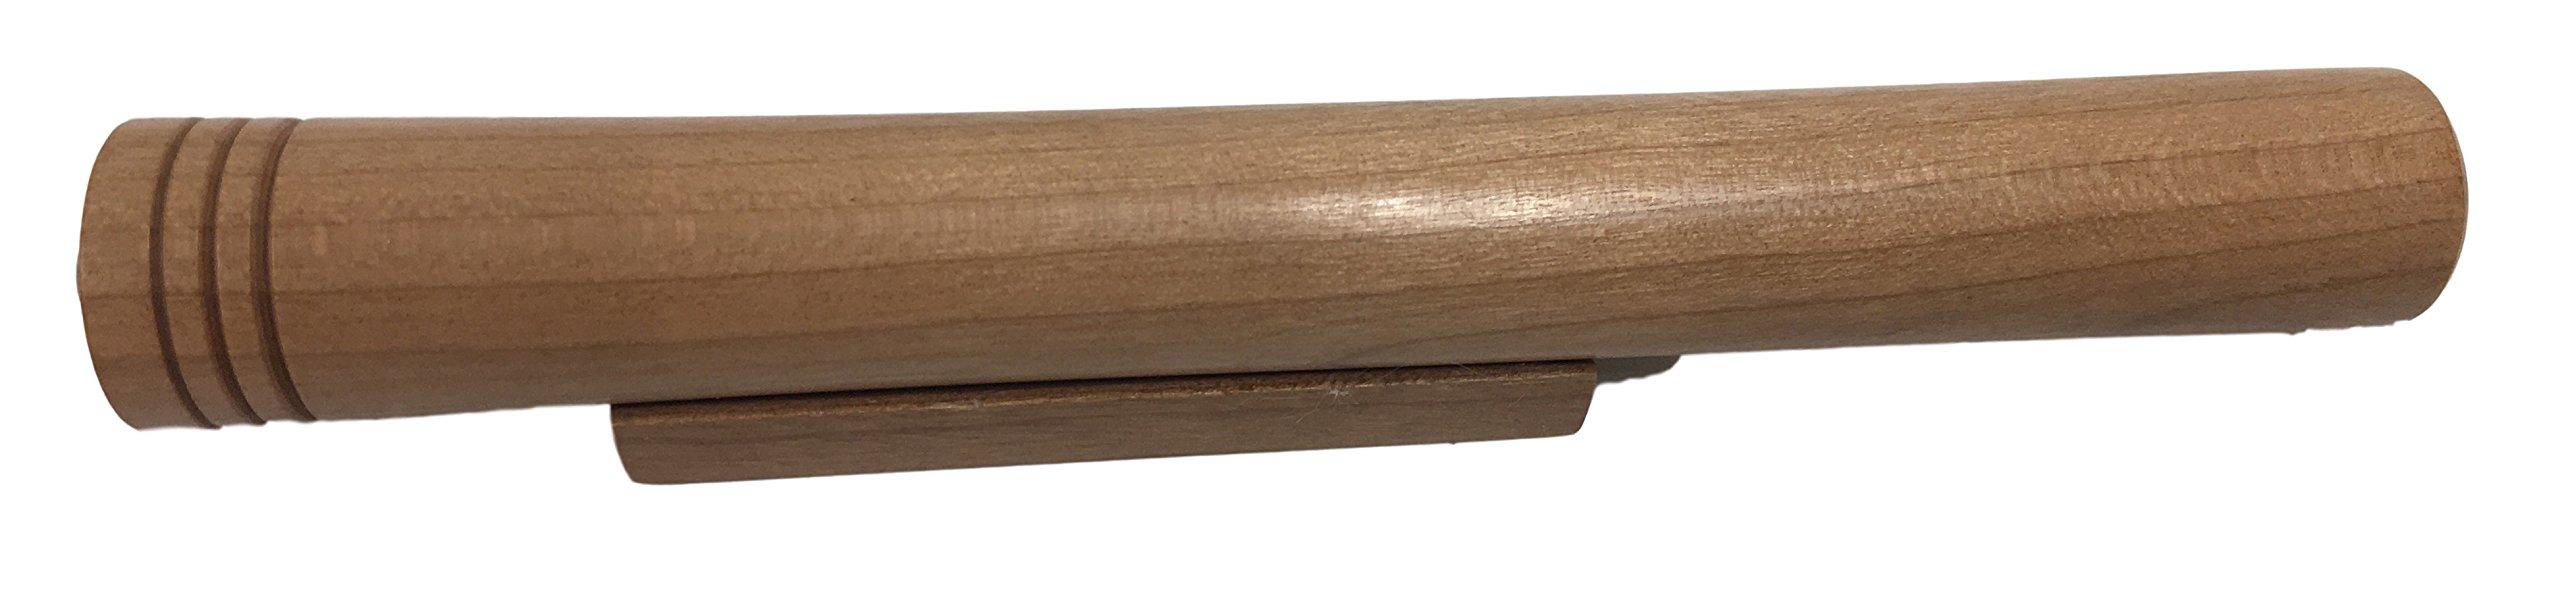 N & J Kaleidoscope Teleidoscope in Solid Cherry Wood, 6 Inches